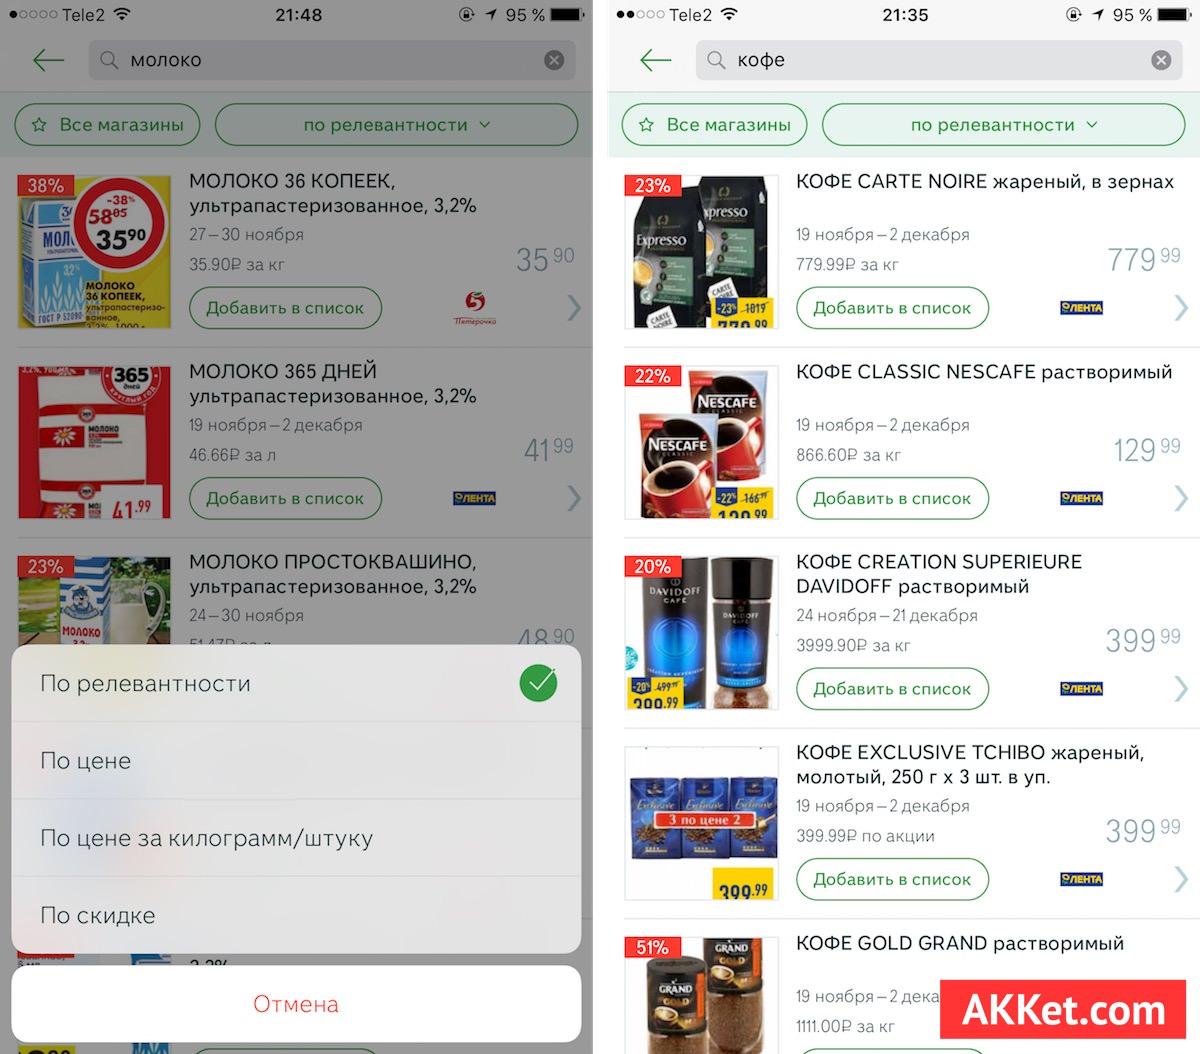 Едадил Россия iOS iPhone iPod TOuch обзор продукты скидки акции Android 4